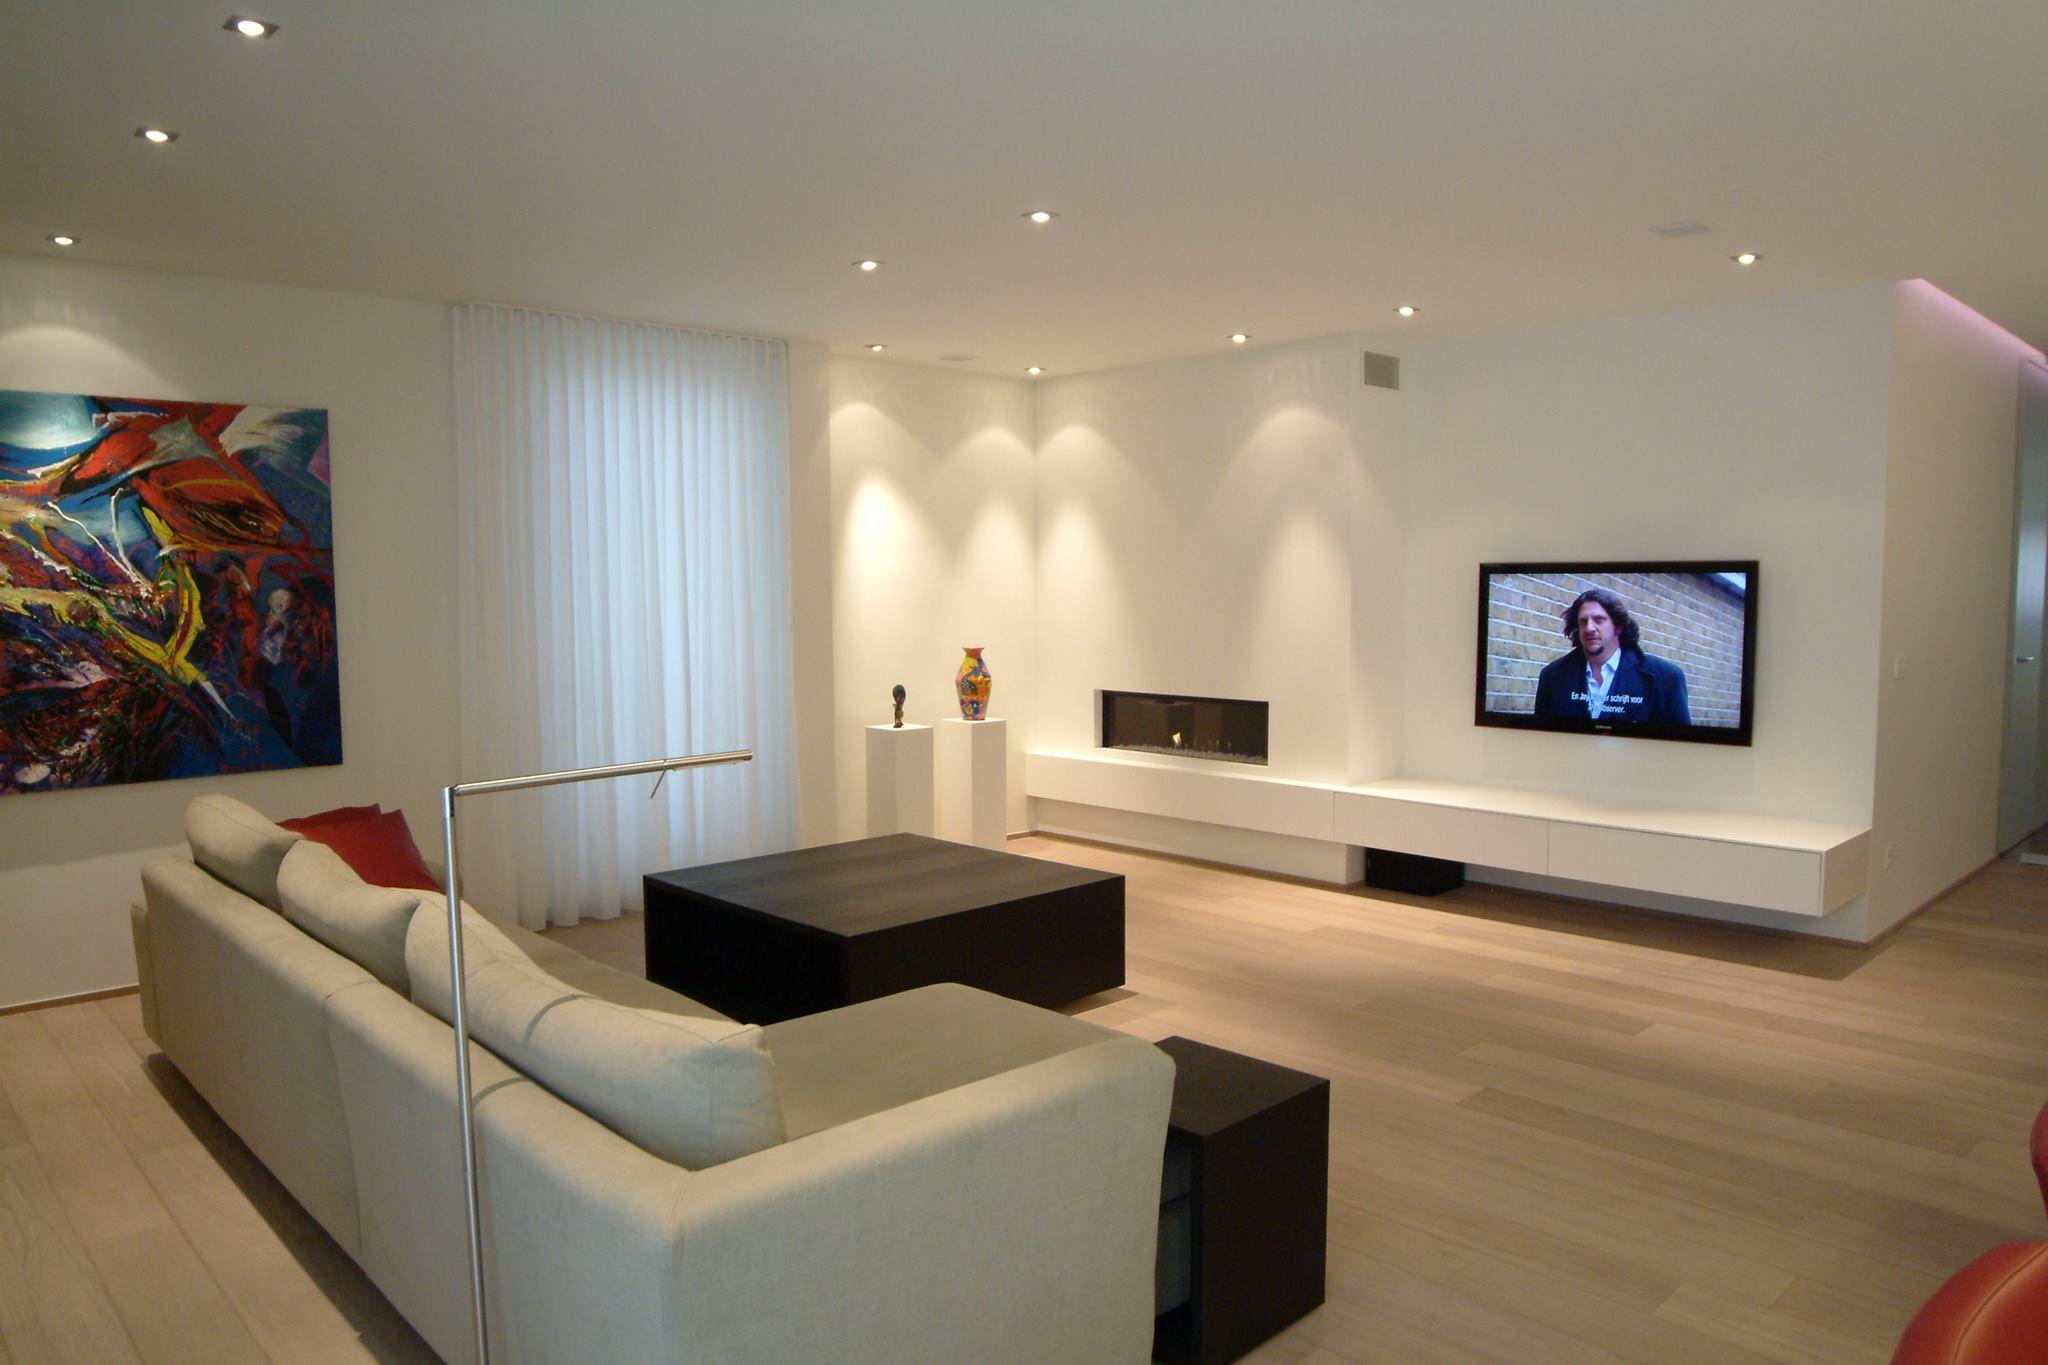 Modern interieur met inbouwkasten parketvloer in moderne living